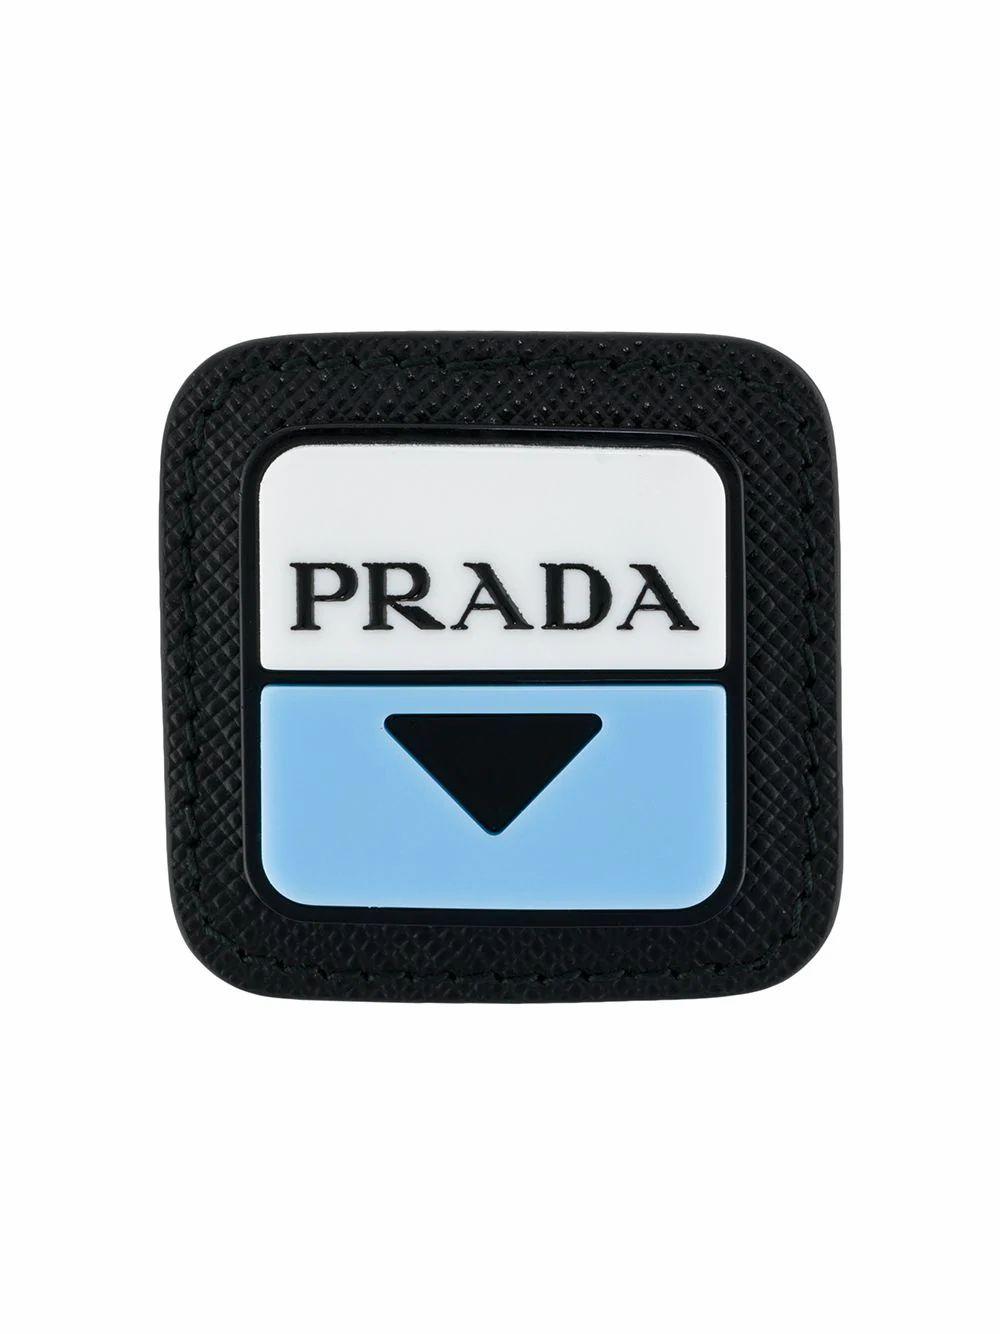 PRADA MEN'S 2IS0582DFHF0237 BLACK LEATHER PIN